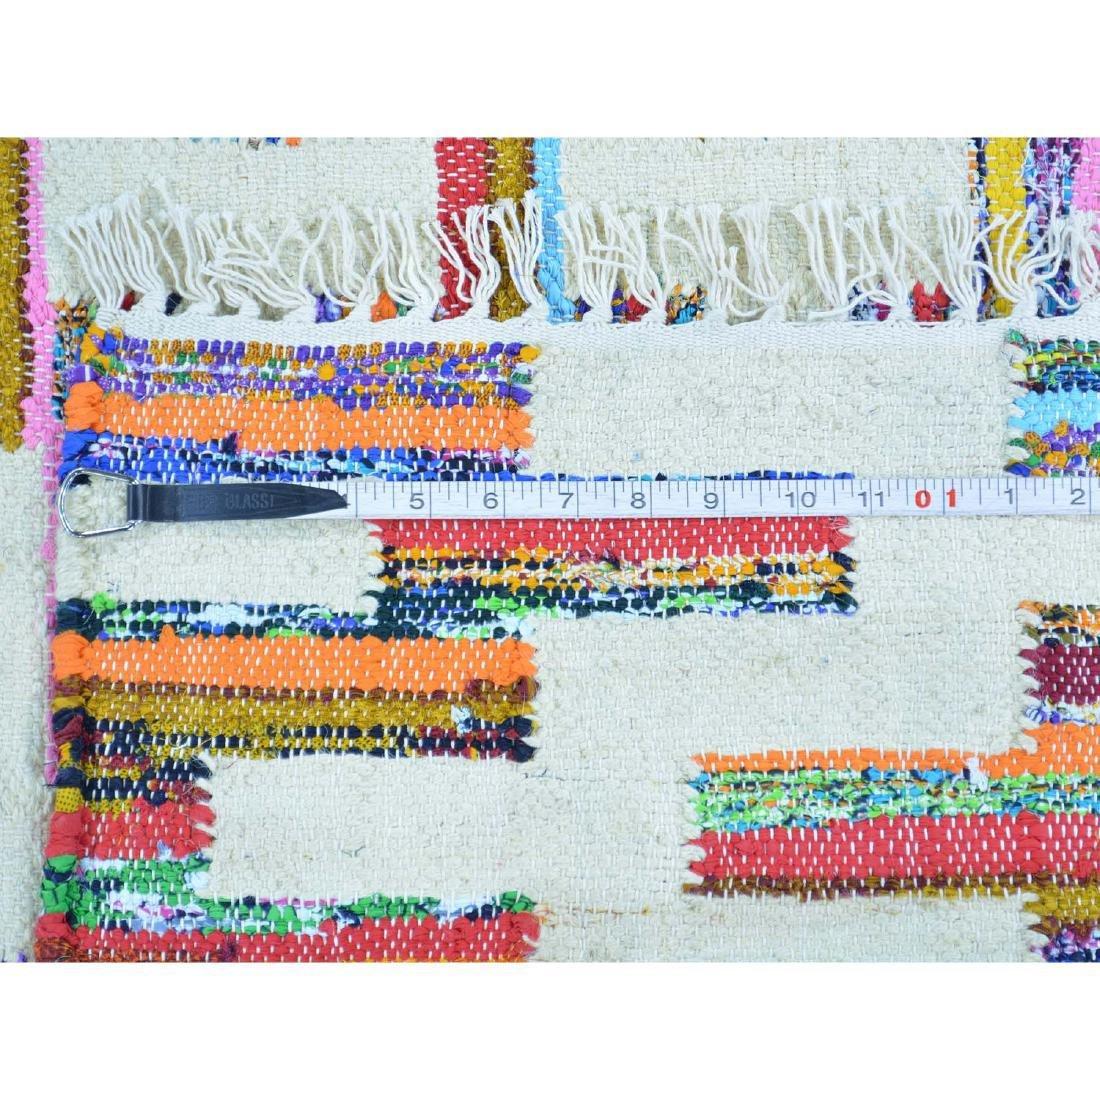 Cotton Sari Silk Flat Weave Kilim Hand Woven Rug 5x7.1 - 5